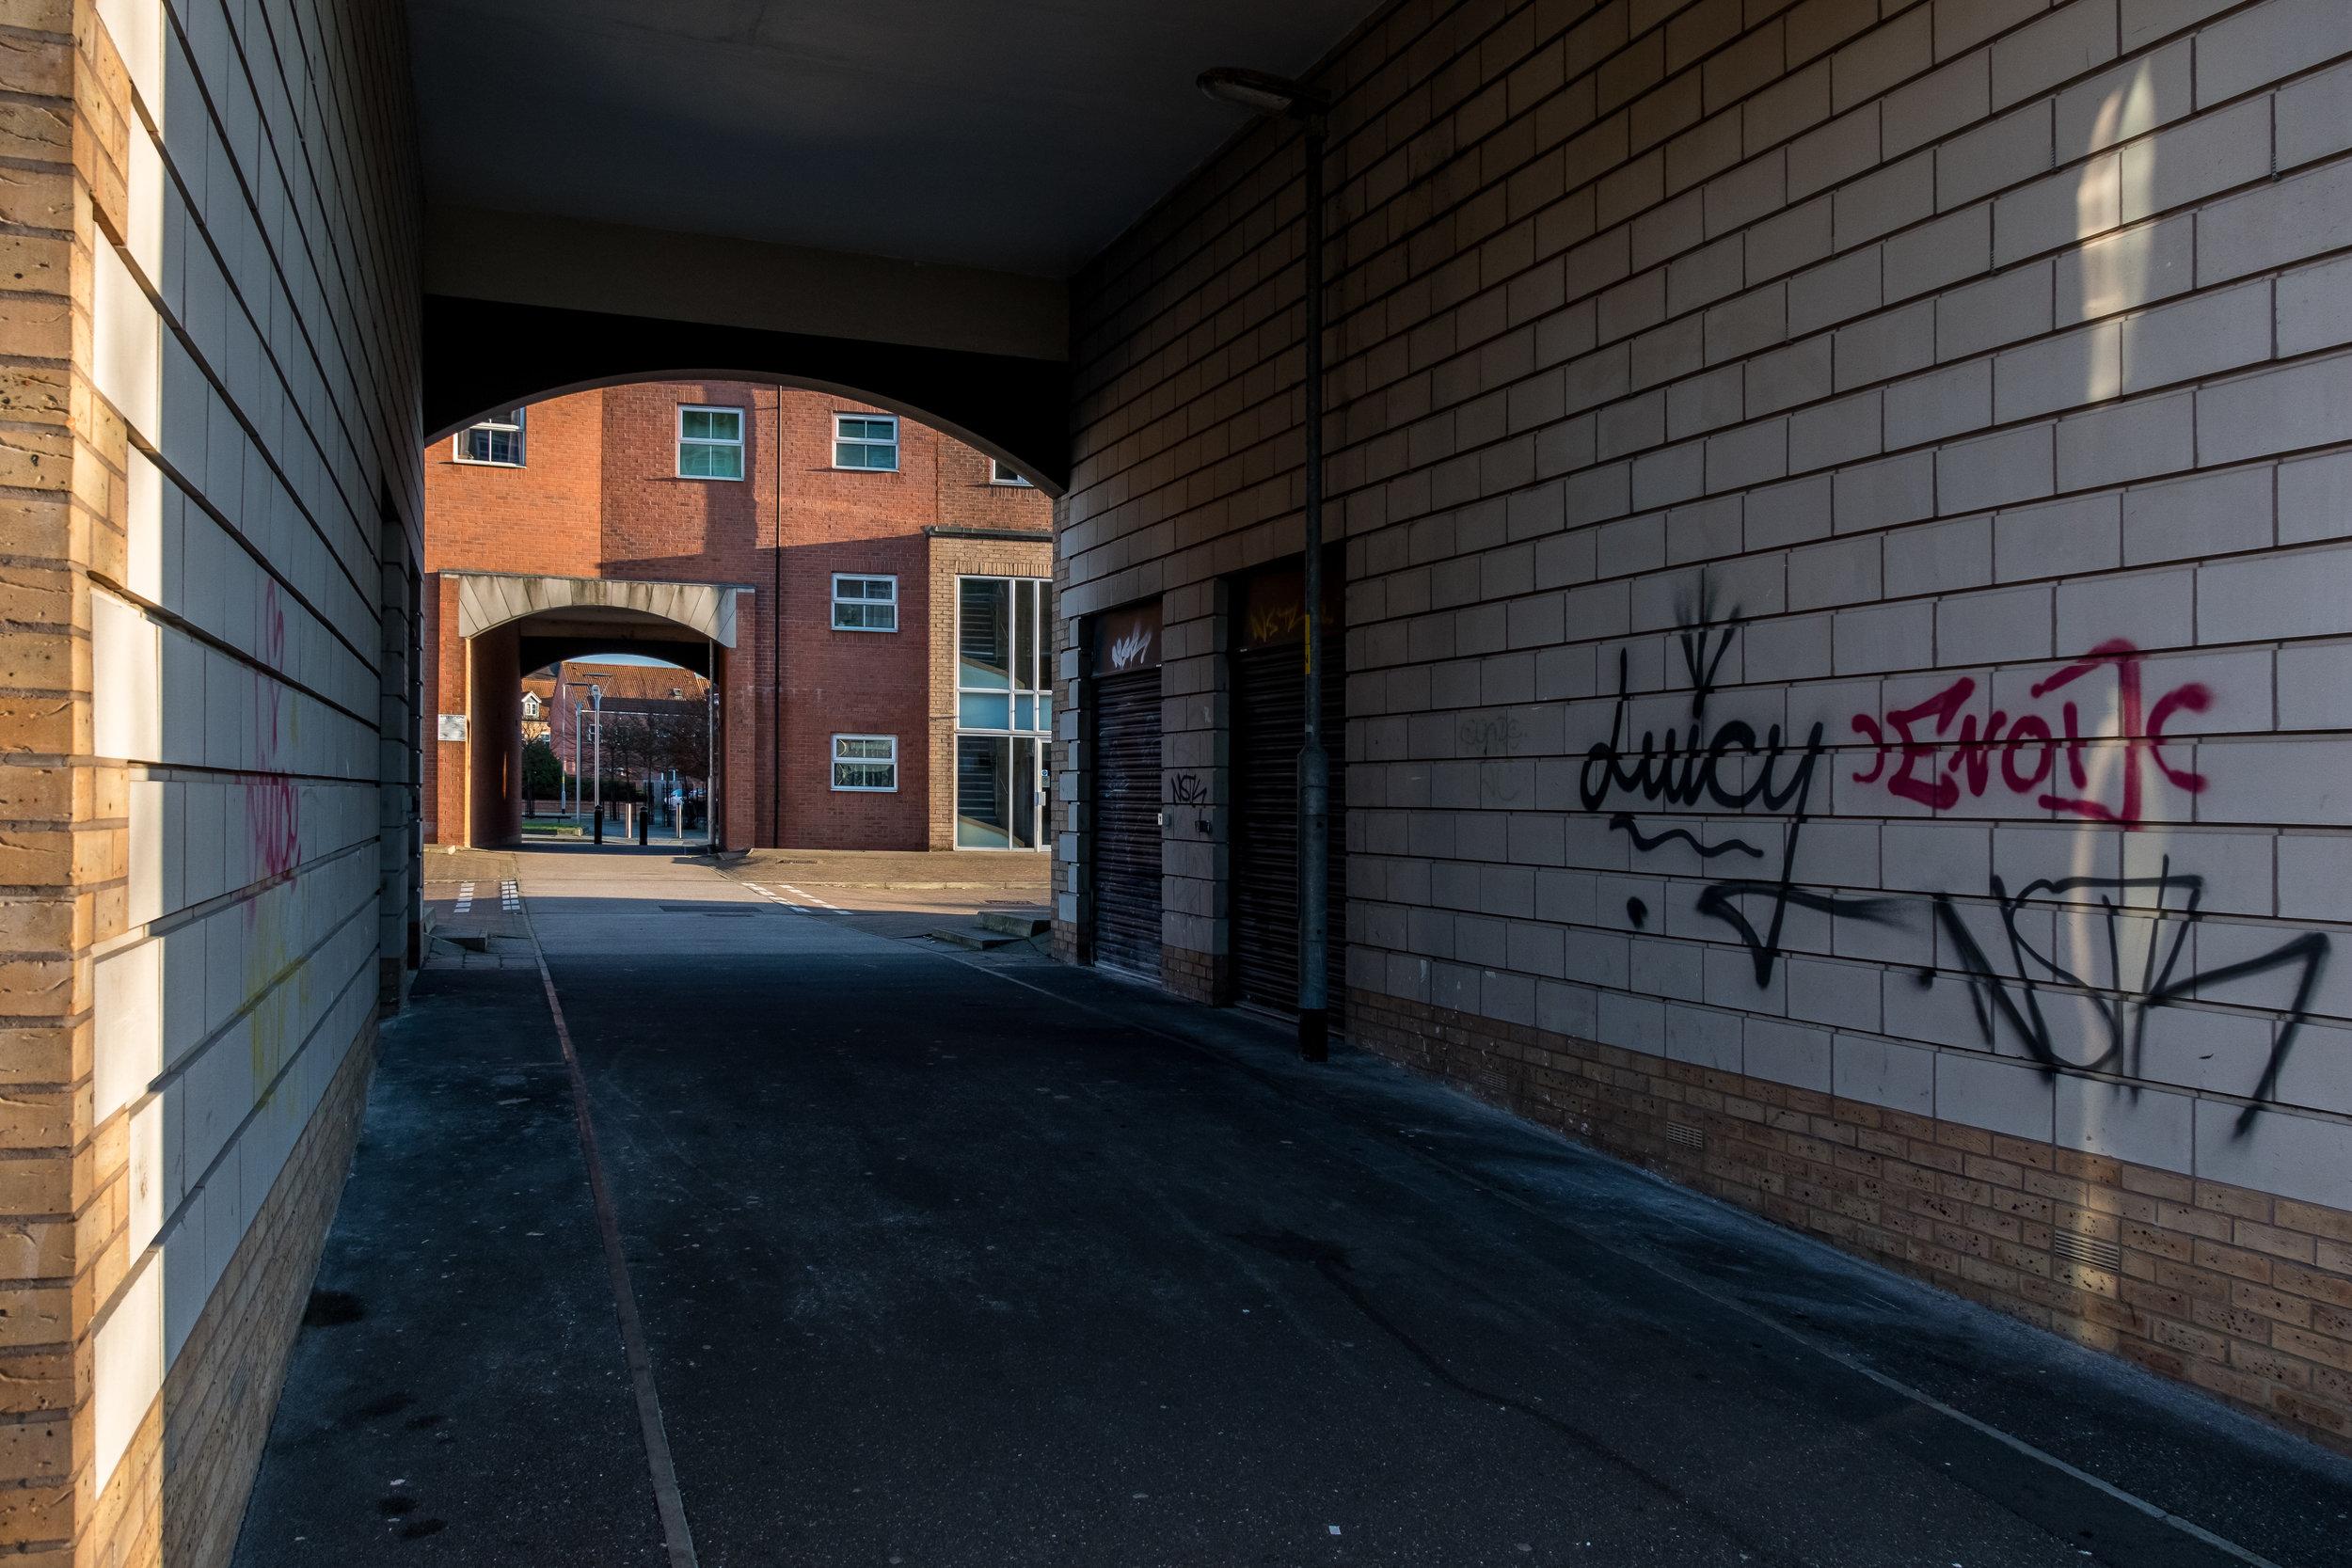 Unwelcome - Riverside Drive